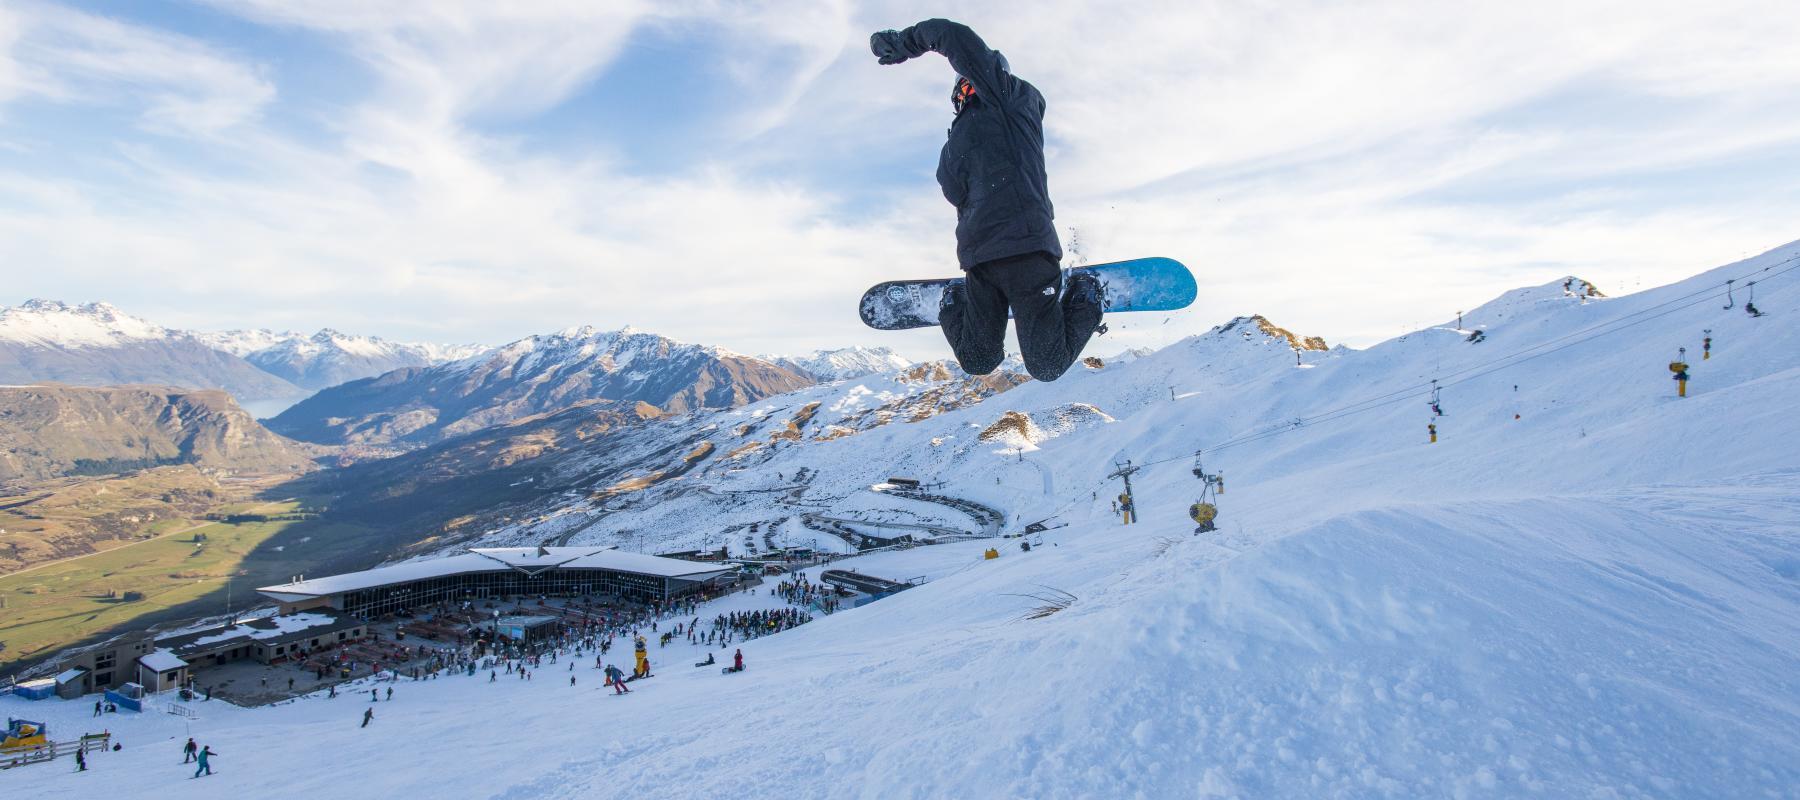 Coronet Peak Snowboarder tricks